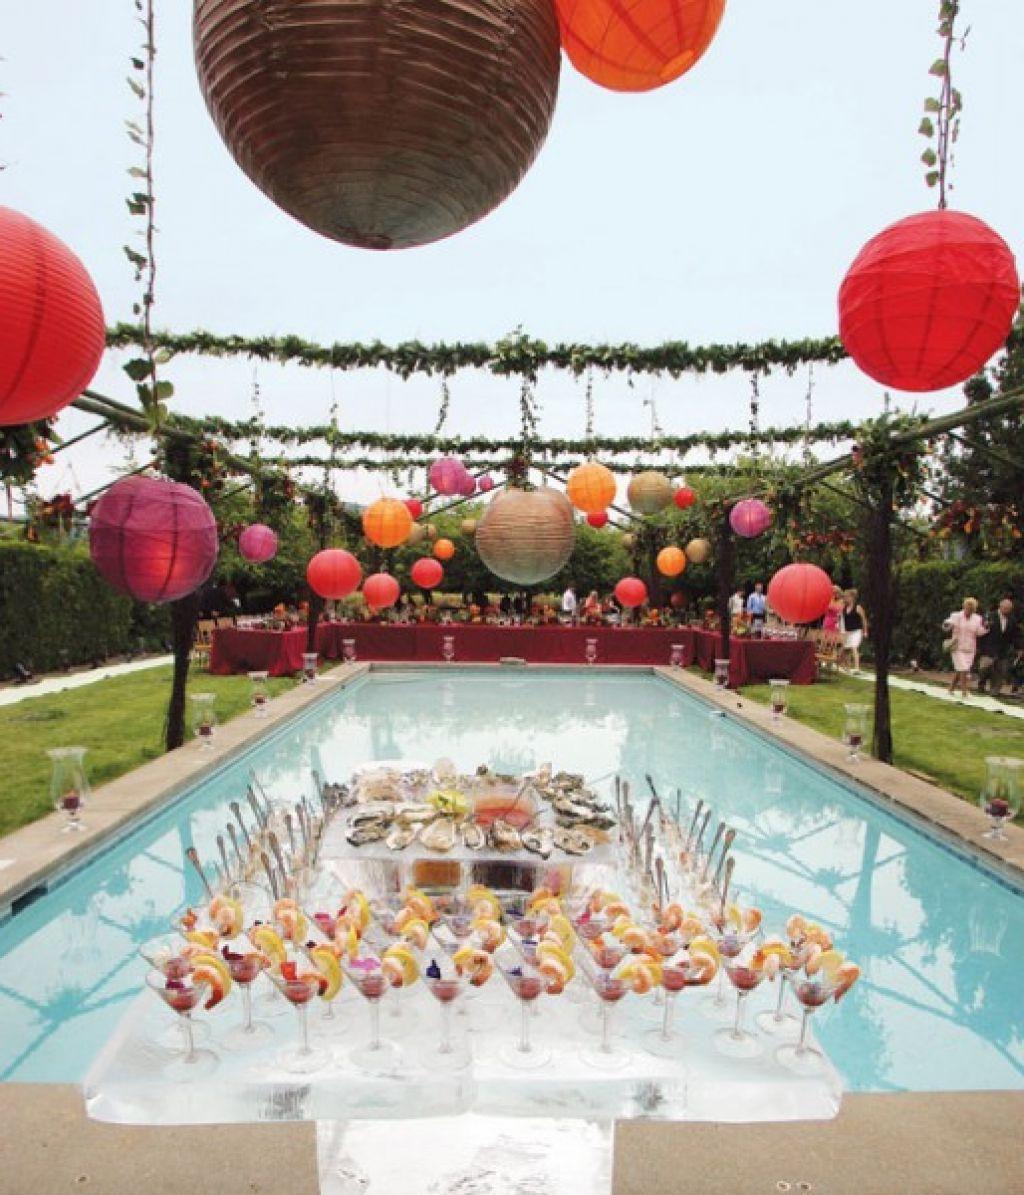 Wedding Reception Pool Party Decorating Ideas